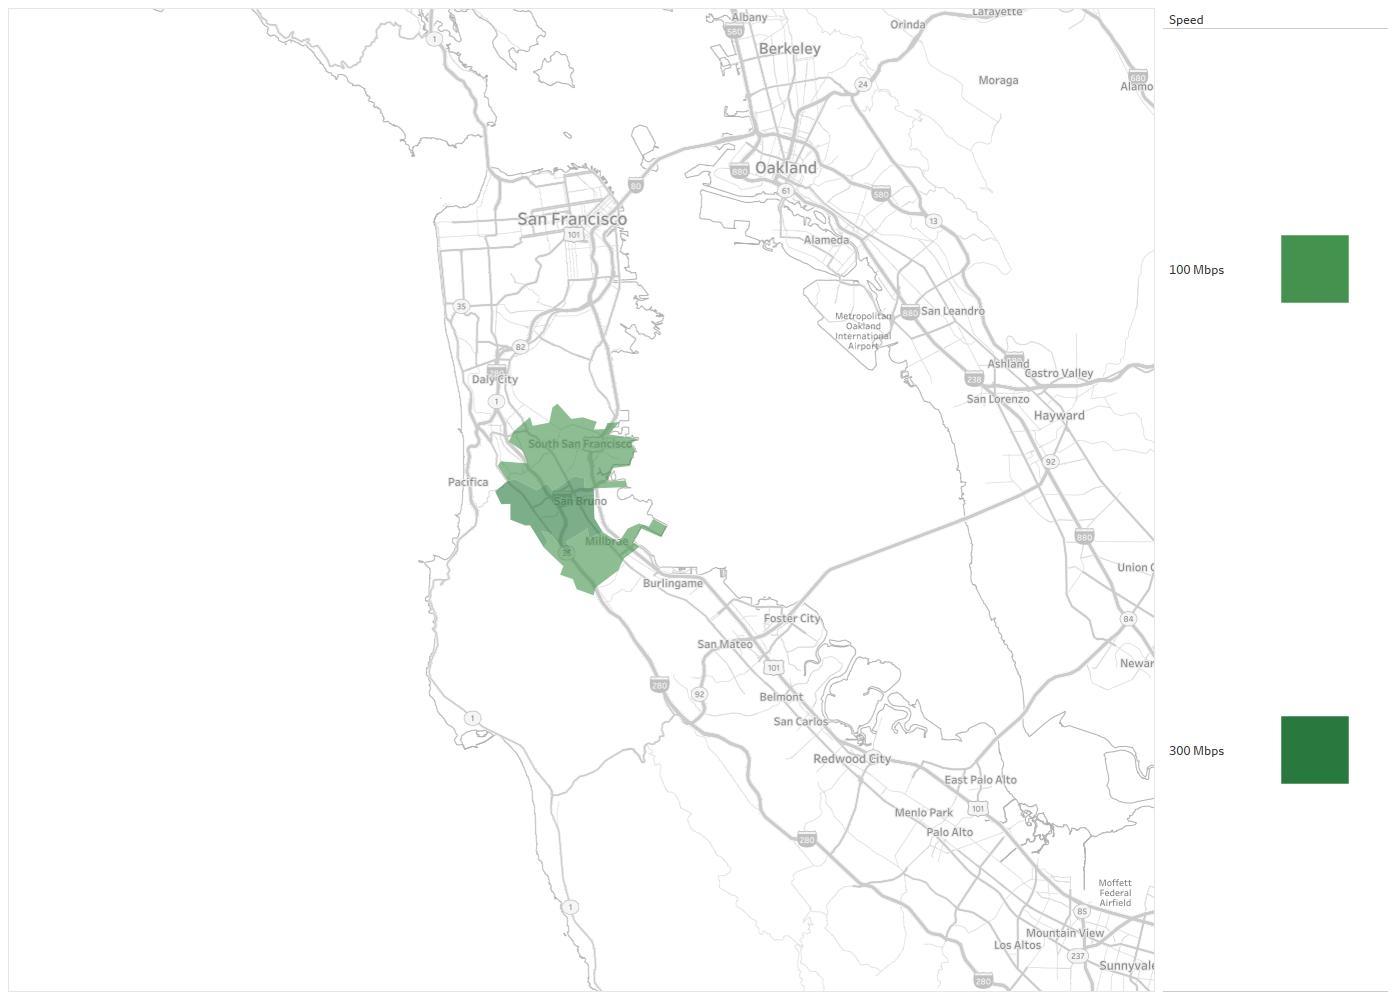 San Bruno Munil Cable TV Availability Areas & Coverage ... on redwood city map, clovis map, escondido village map, pleasanton map, north san francisco map, port of san francisco map, berkeley map, south san francisco ca map, cathedral city map, san pablo map, lafayette map, porterville map, market st san francisco map,